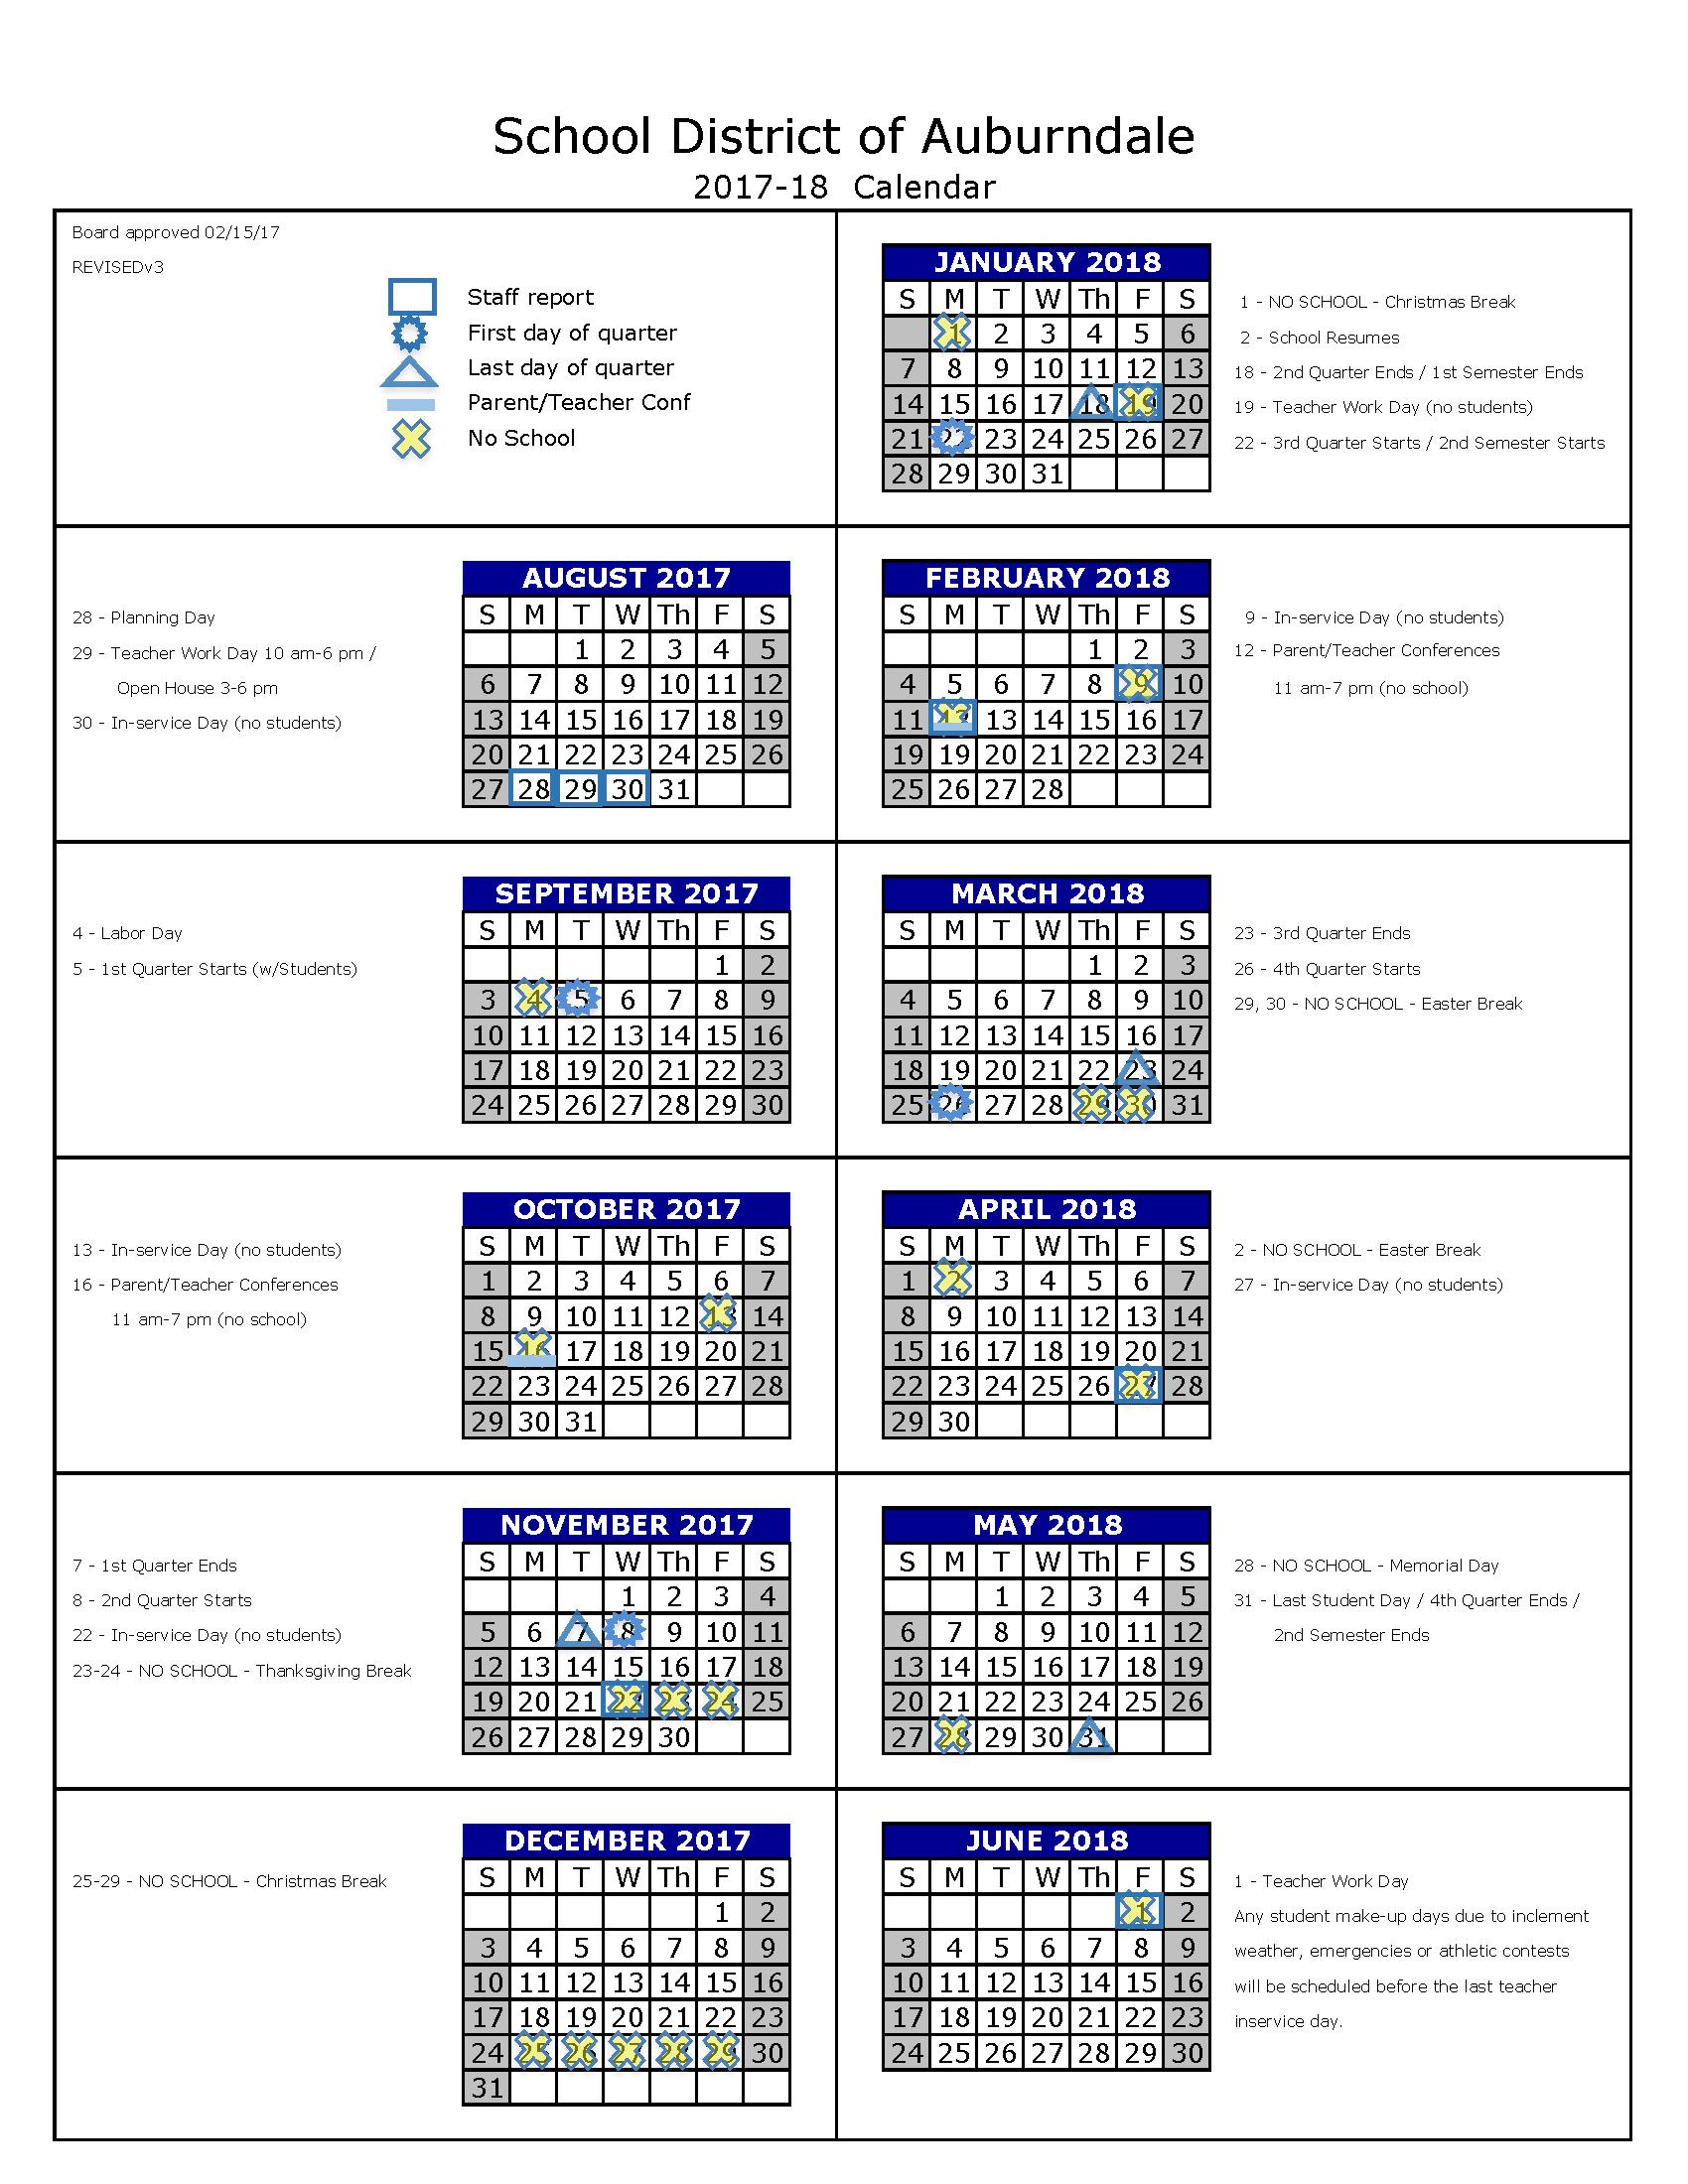 School Year Calendar / Auburndale School Year Calendar